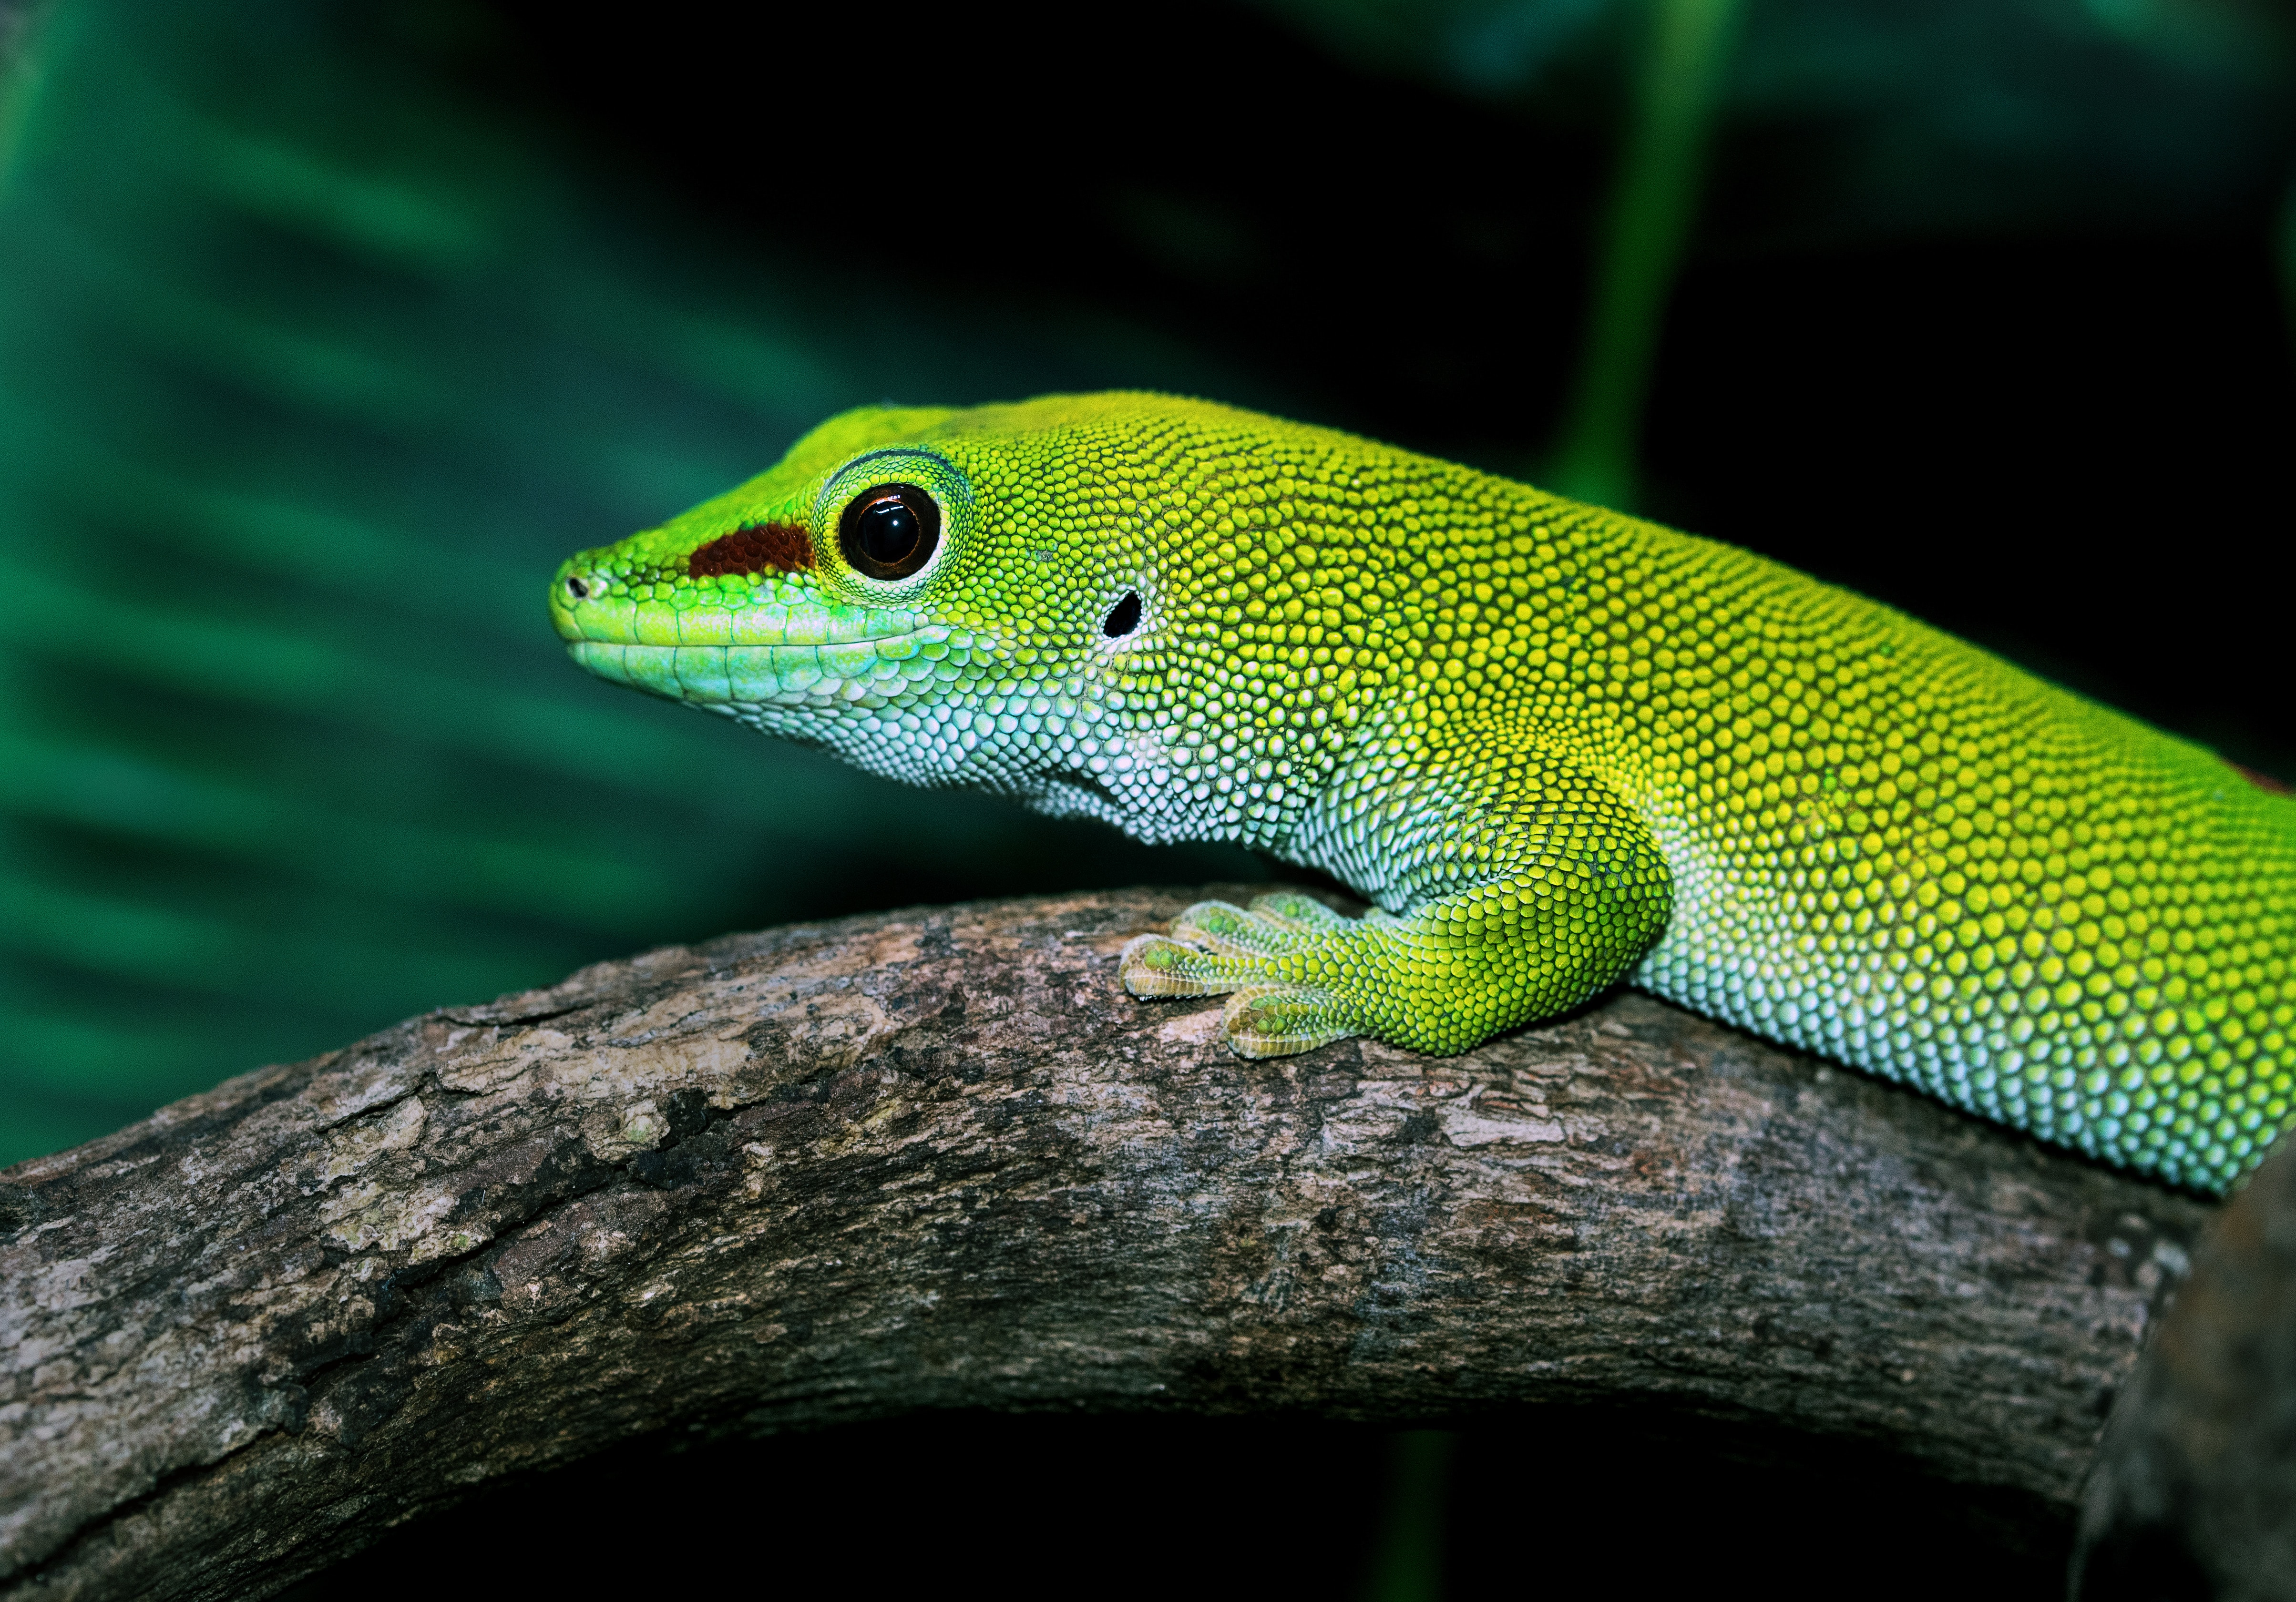 Madagascan Day Gecko